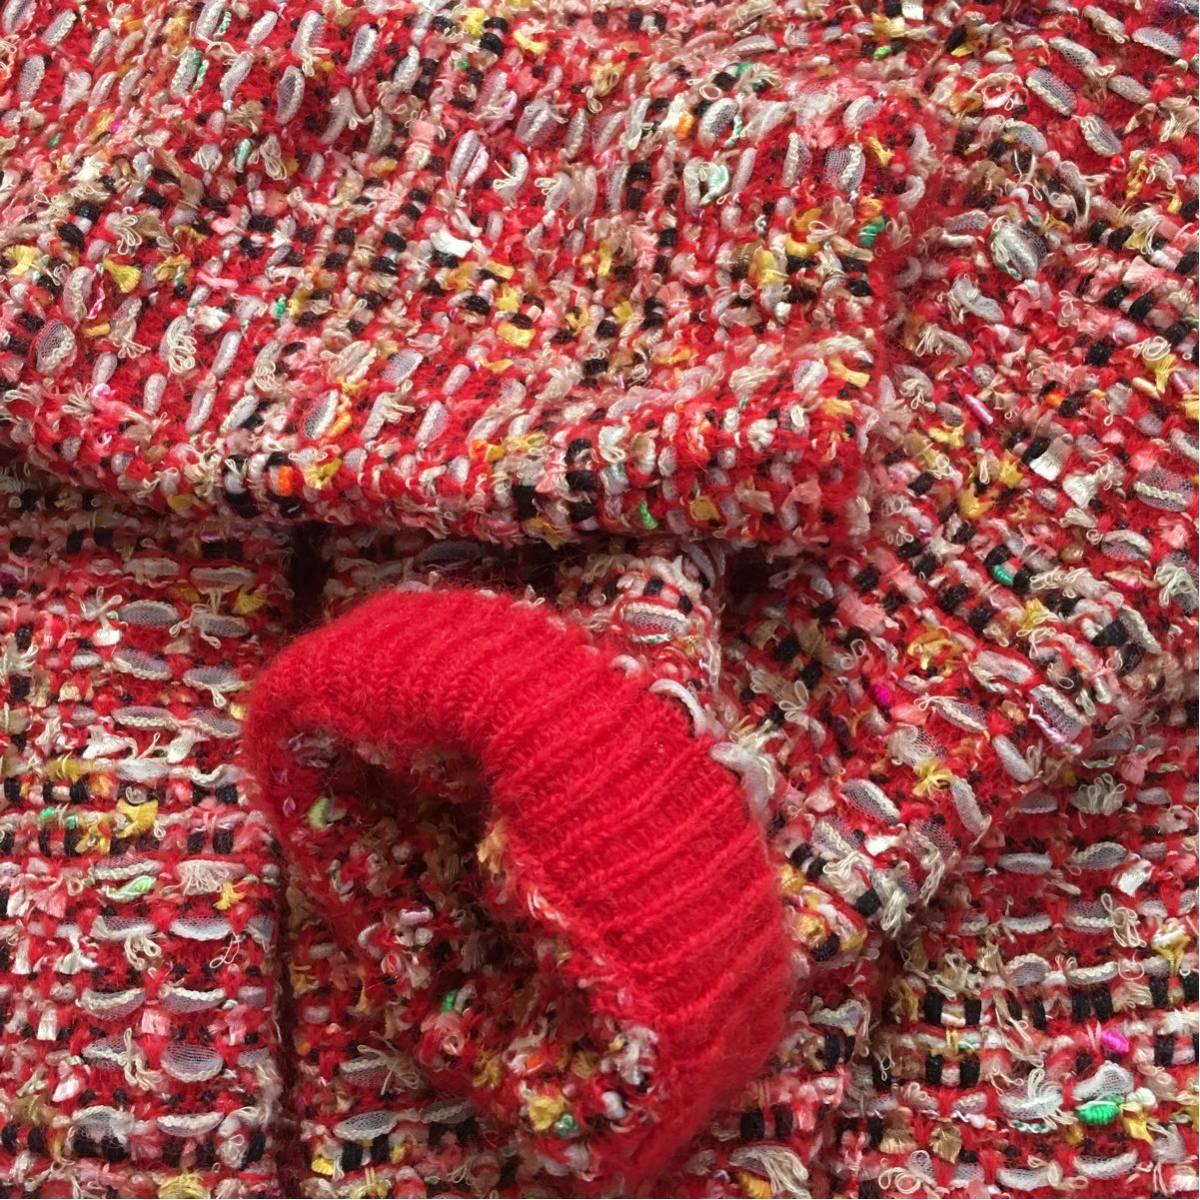 k 美品 Coohem(コーヘン) 個性的なツイードコート 赤系 36サイズ 可愛いジャケットコート_画像6